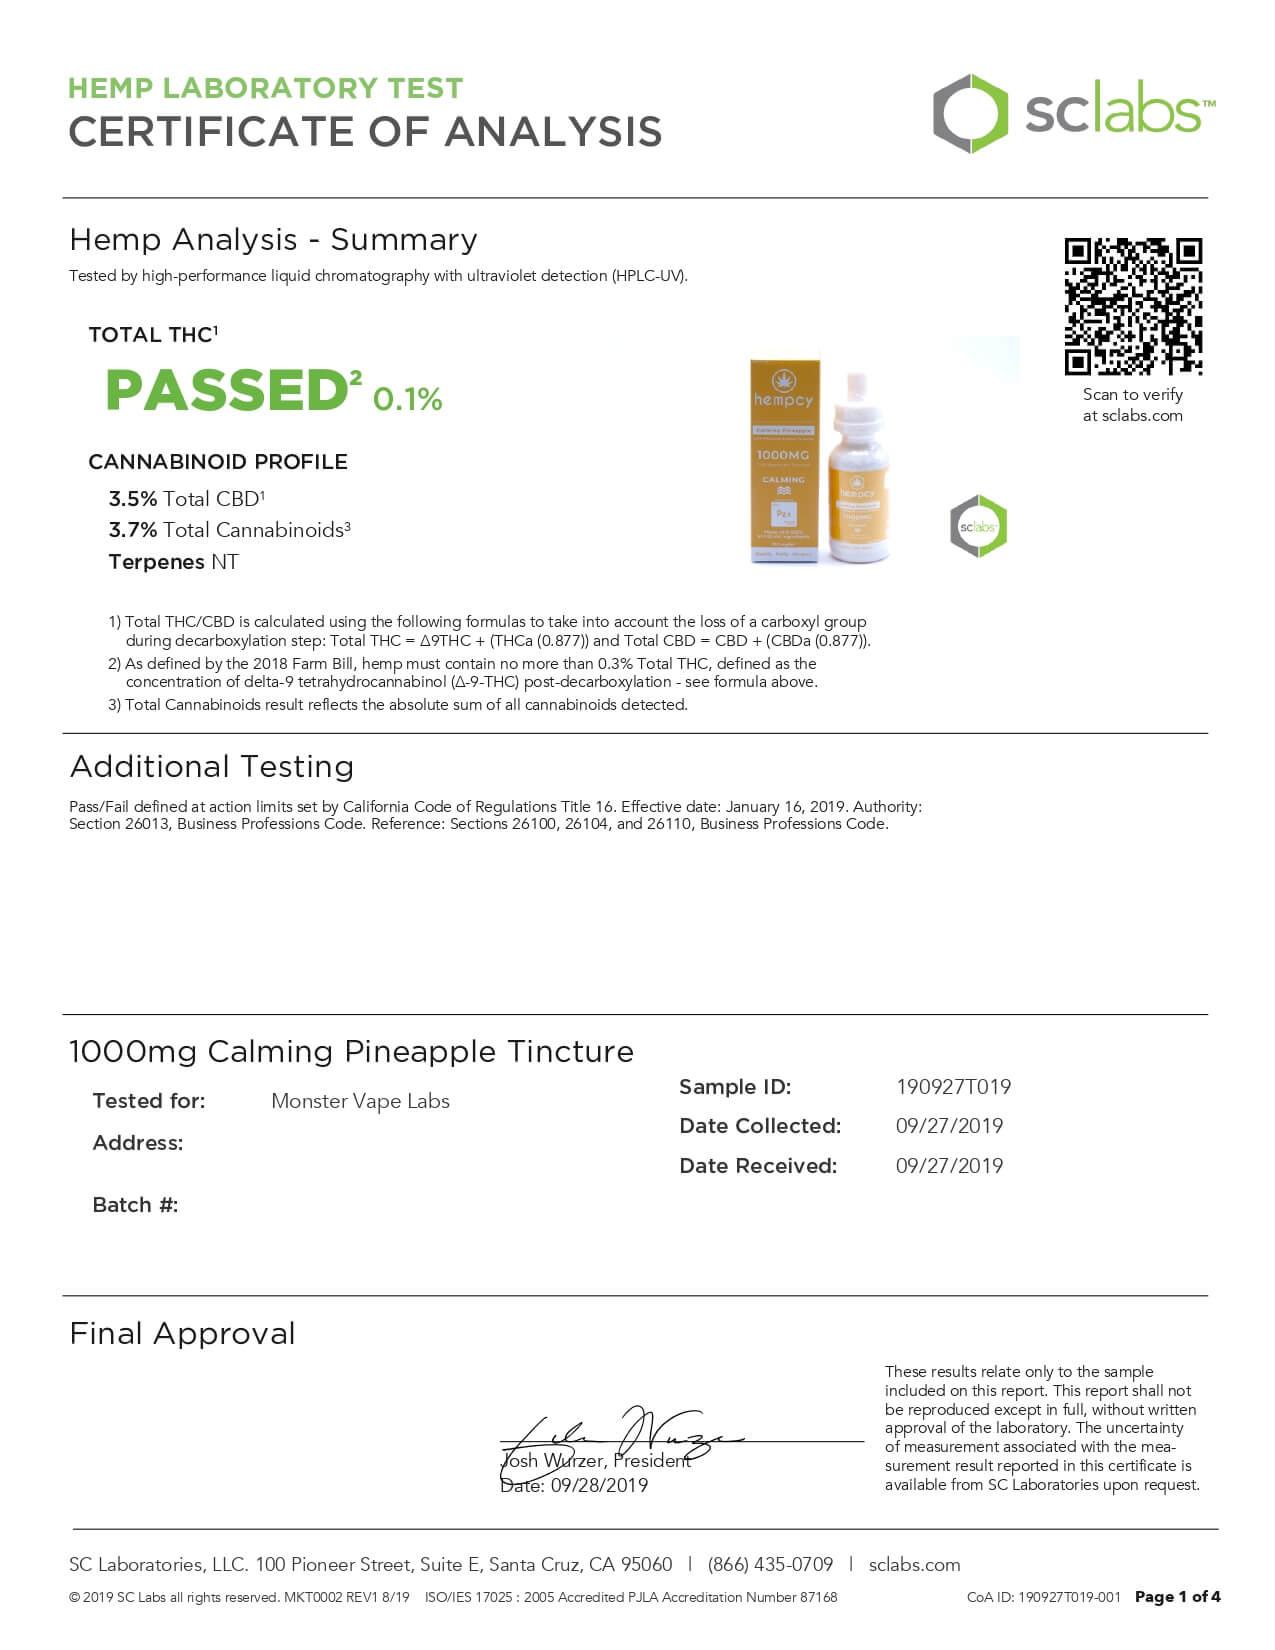 Hempcy CBD Tincture Calming Pineapple 1000mg Lab Report